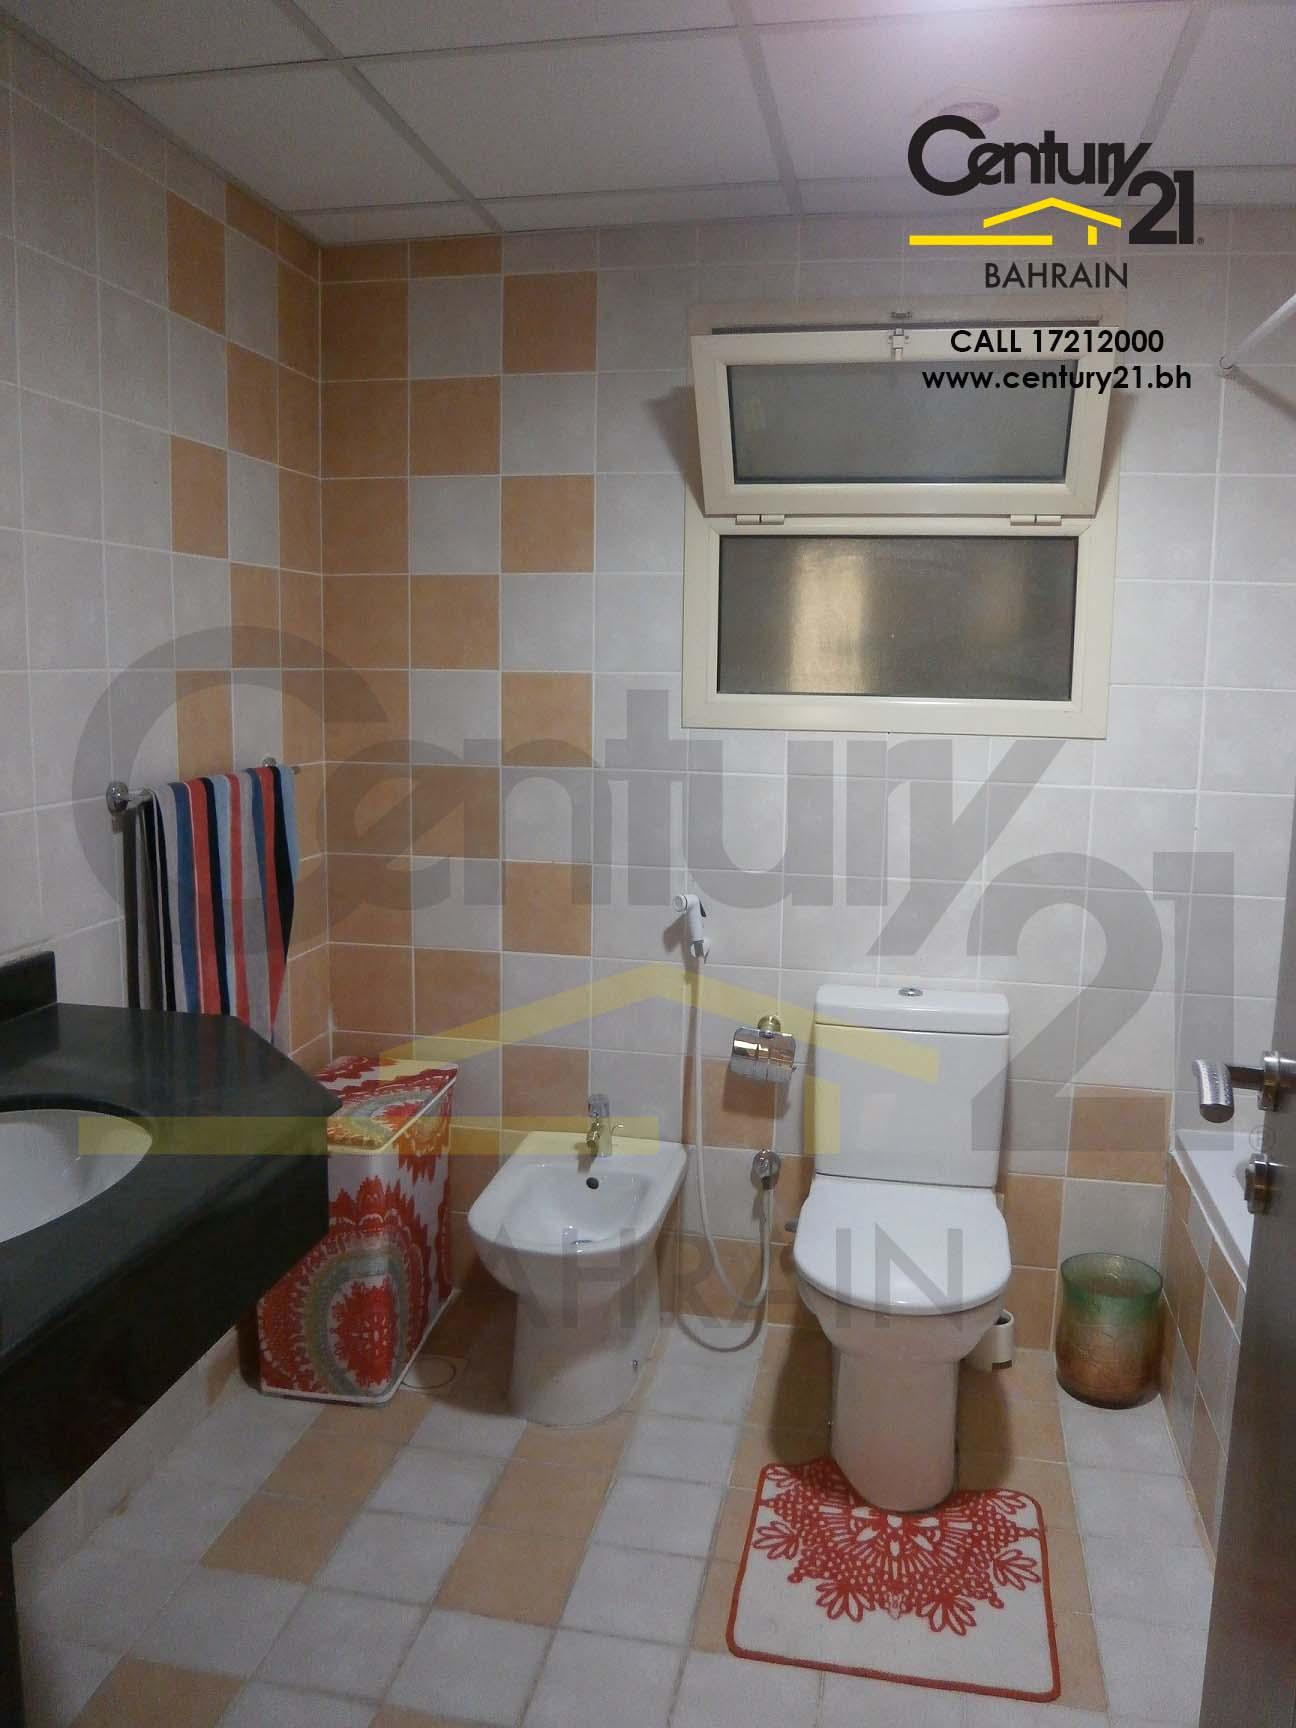 3 bedroom apartment for rent in juffair fr747 century 21